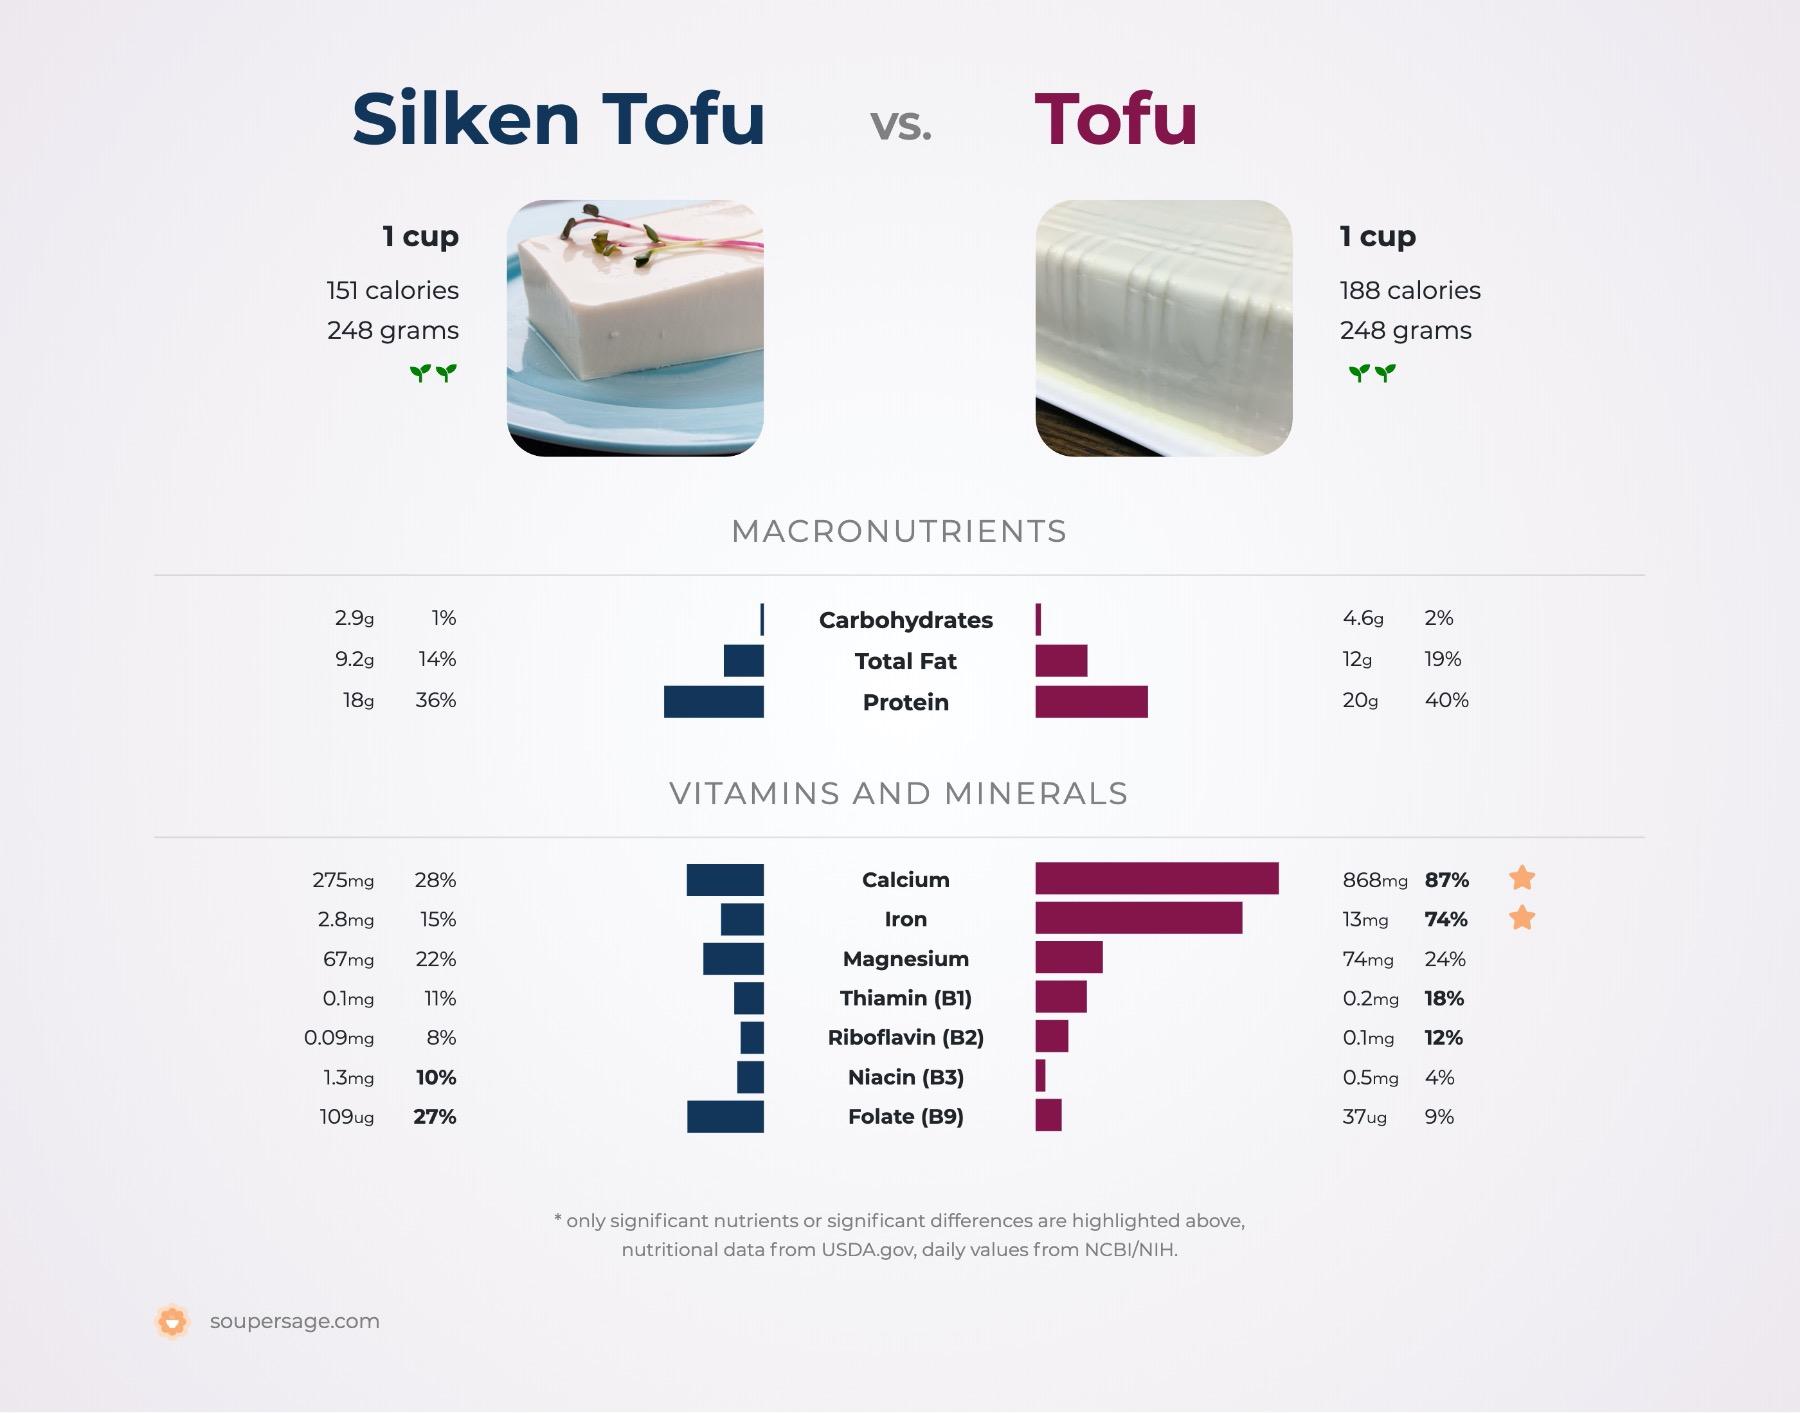 nutrition comparison of silken tofu vs. tofu